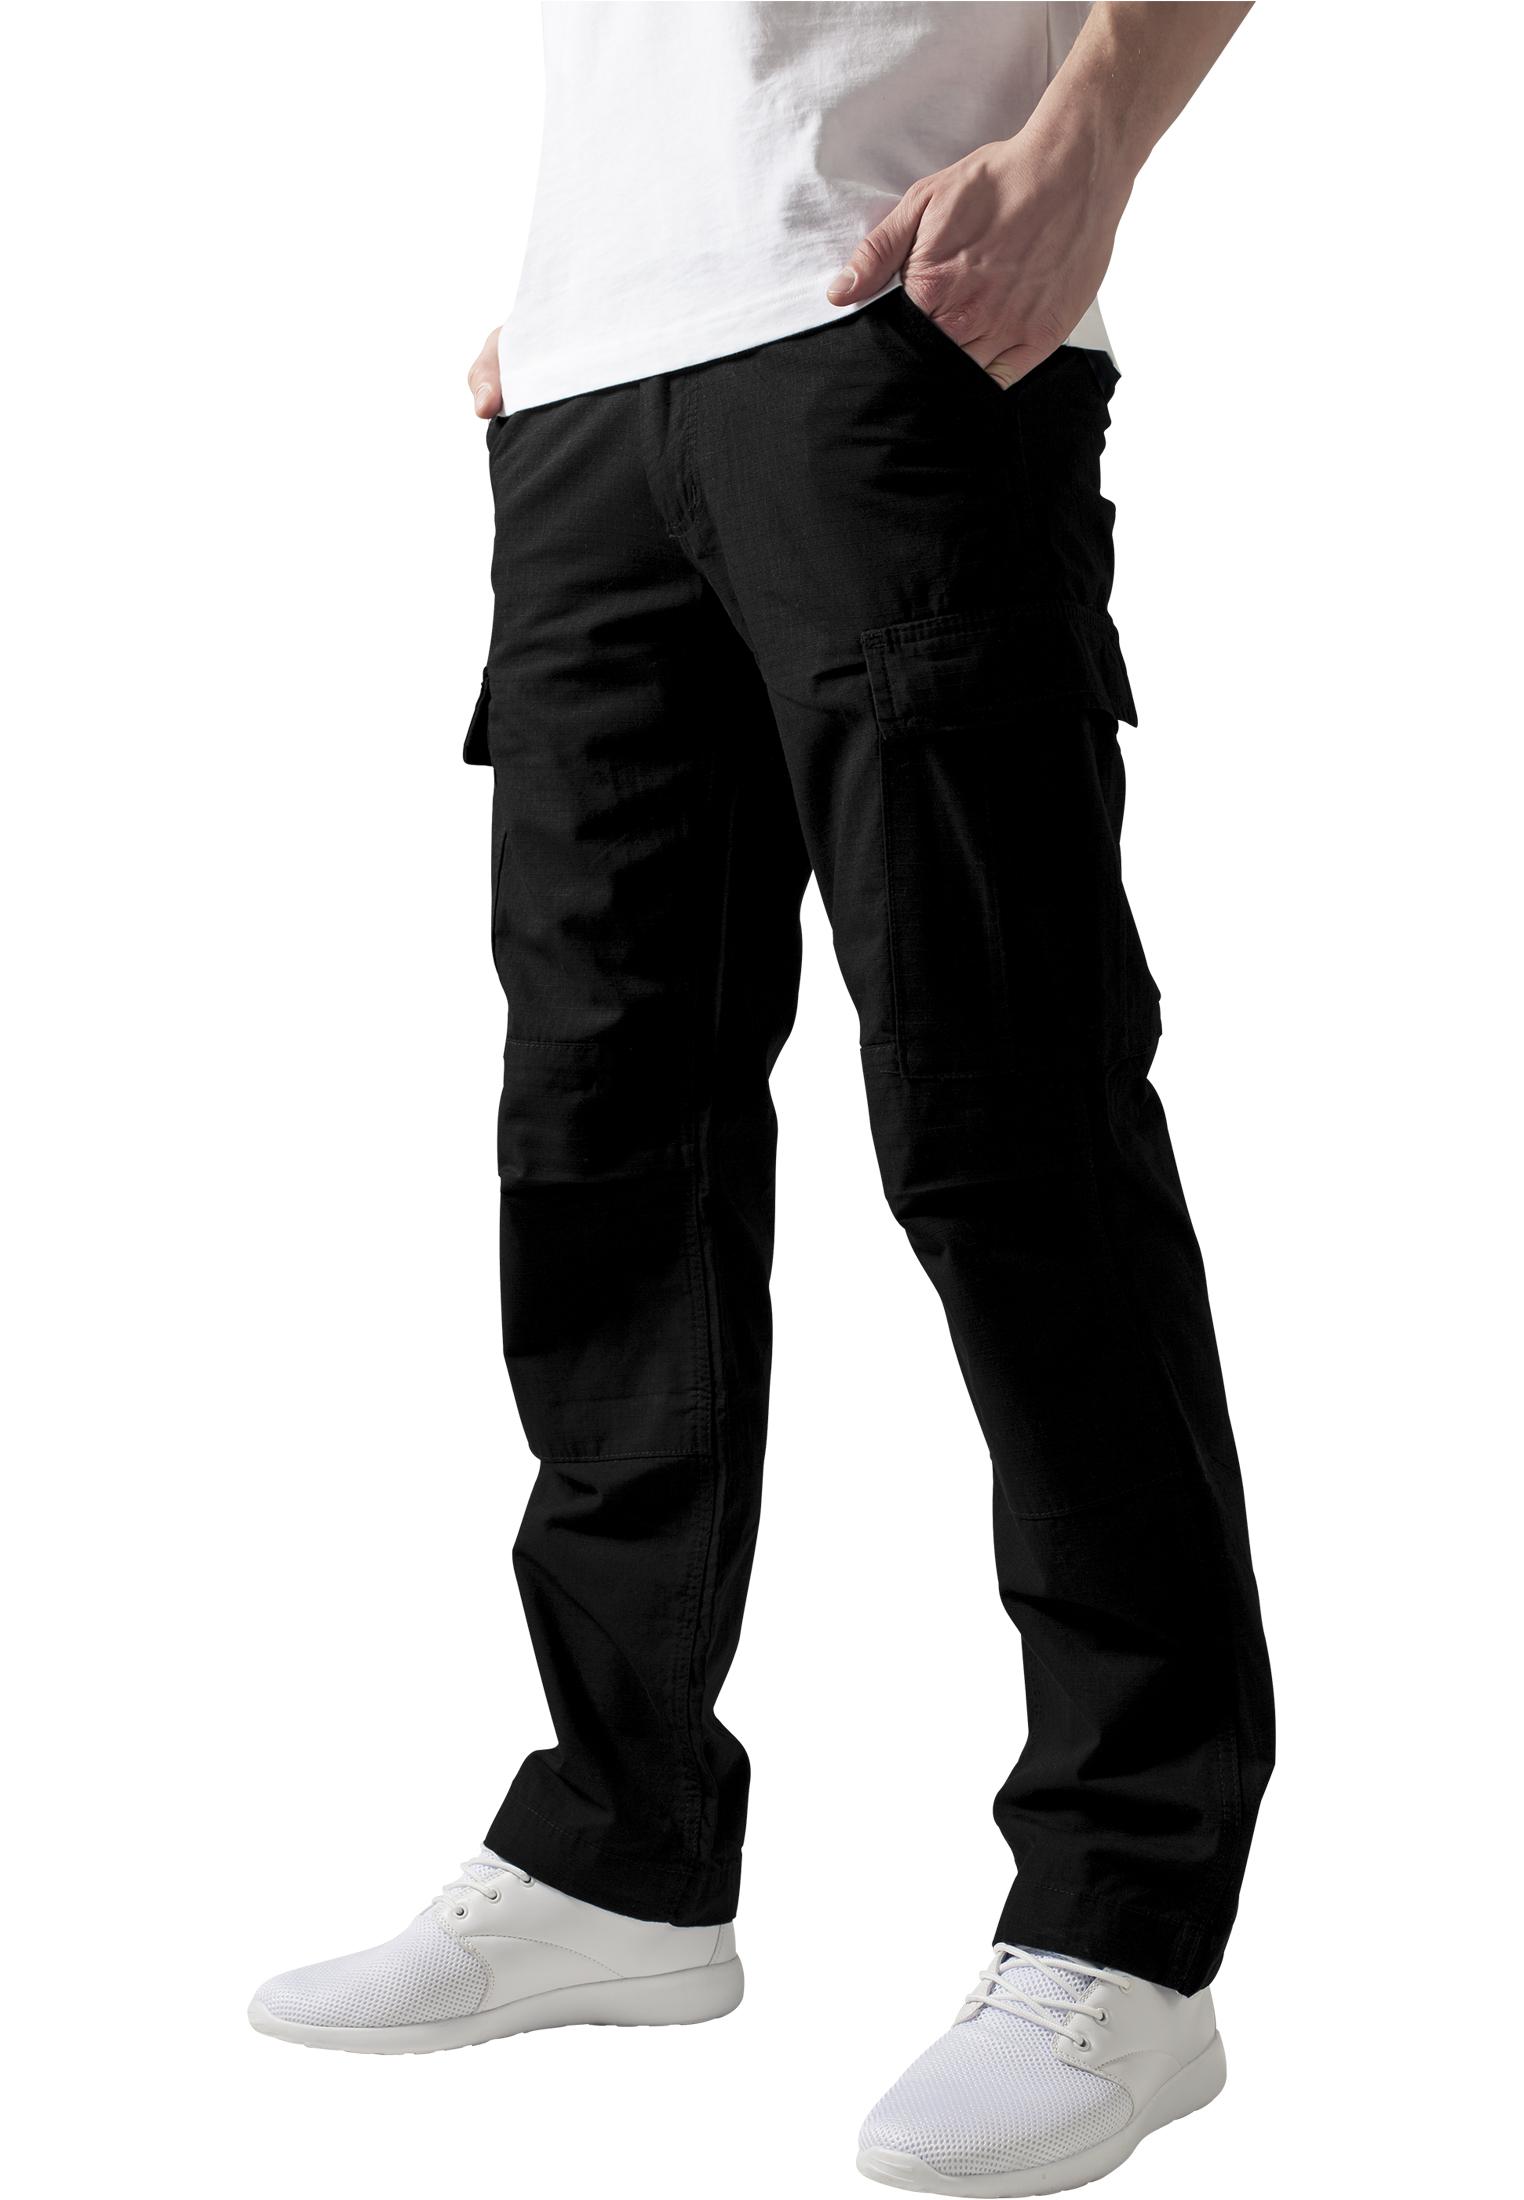 26895ce1d917 Pánske kapsáčové nohavice URBAN CLASSICS Camouflage Cargo Pants black. 1